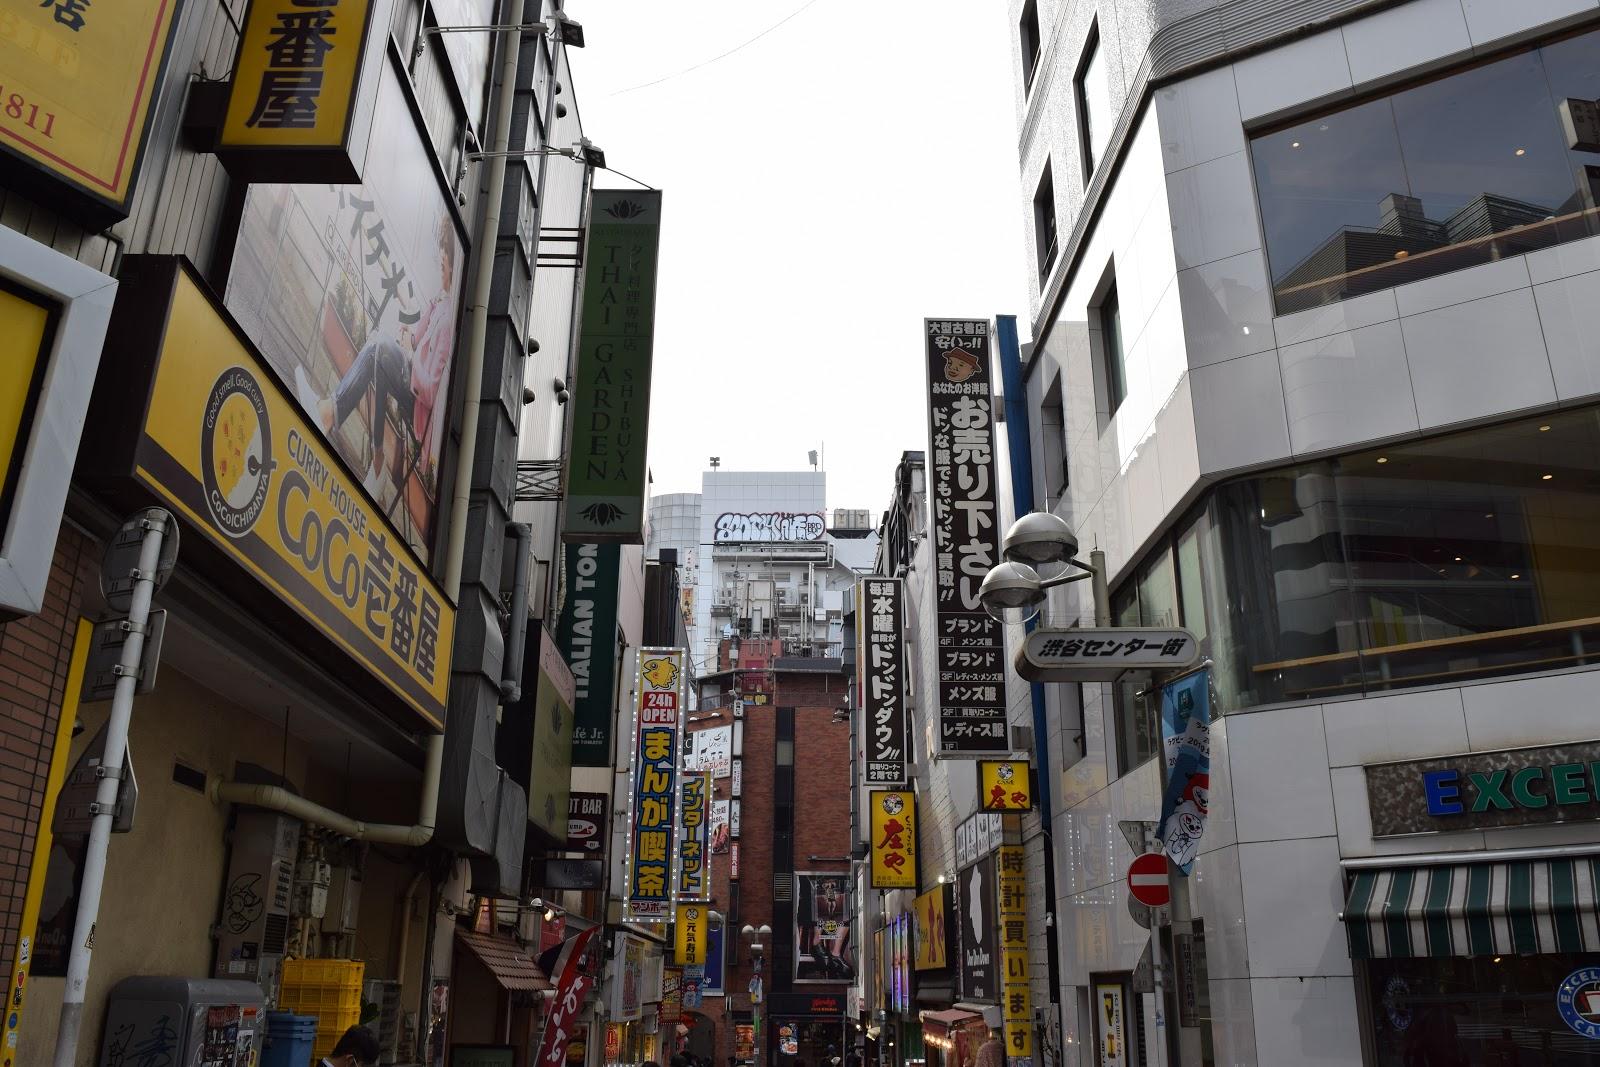 Street in Shibuya Tokyo